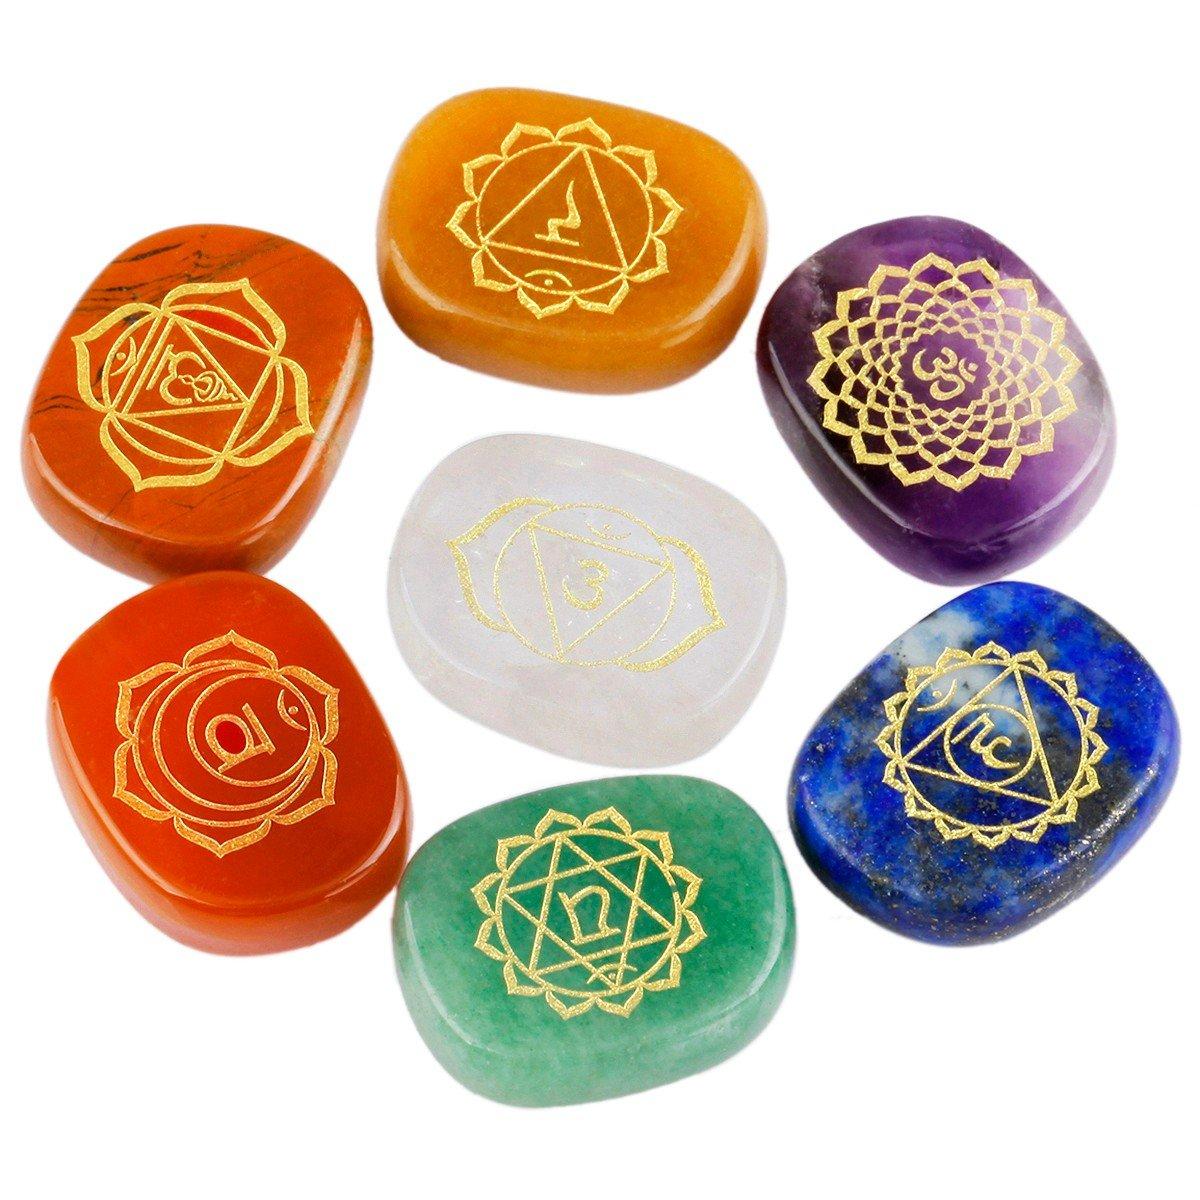 rockcloud Healing Crystal 7 Chakra Stones Polished Engraved Palm Pocket Stone Reiki Balancing